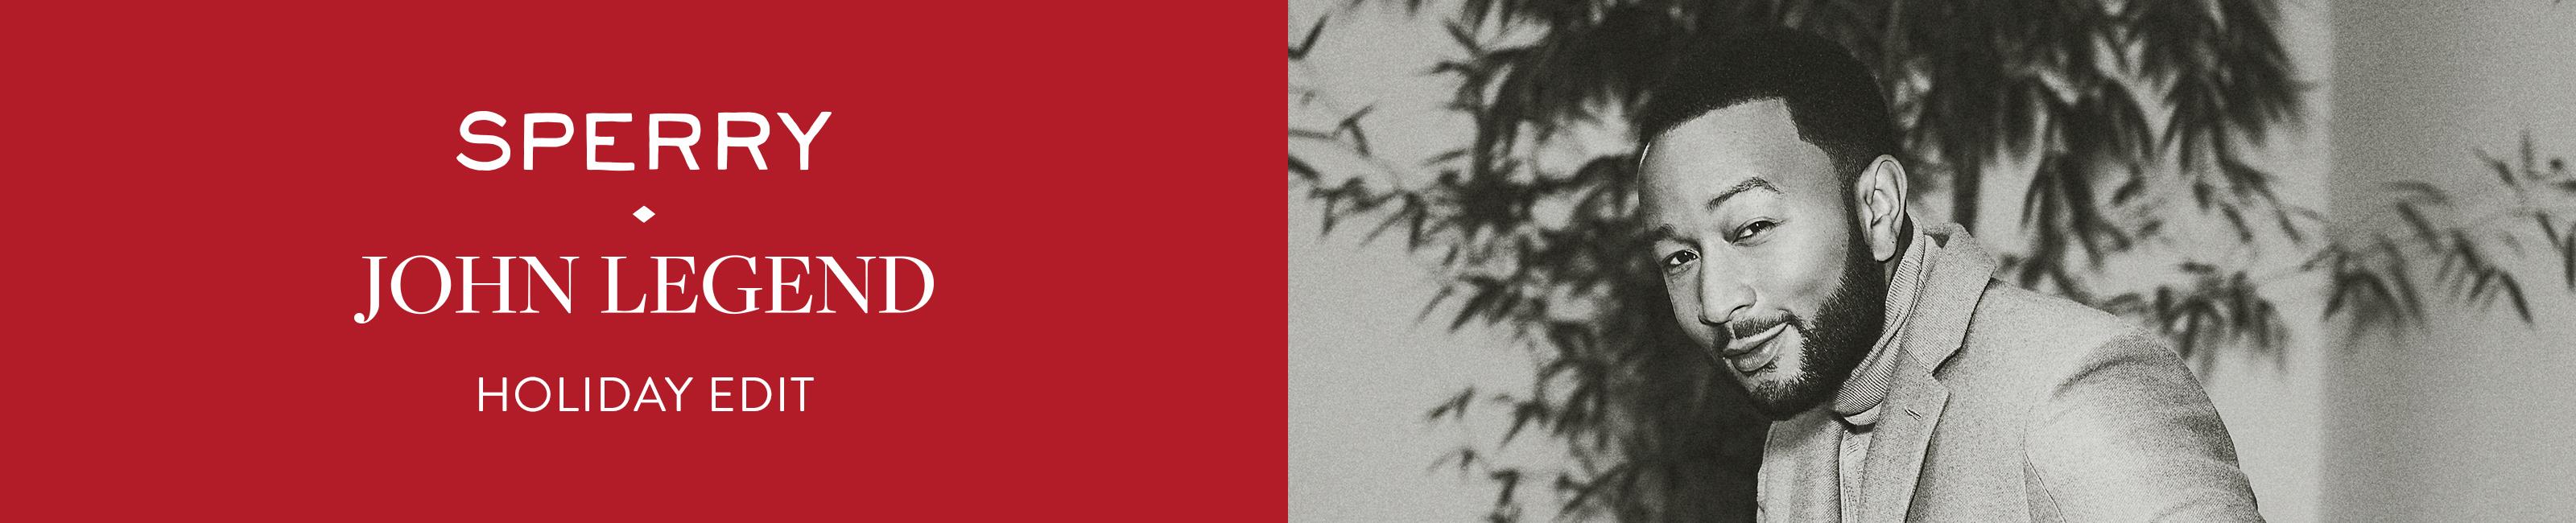 Sperry - John Legend - Holiday Edit.